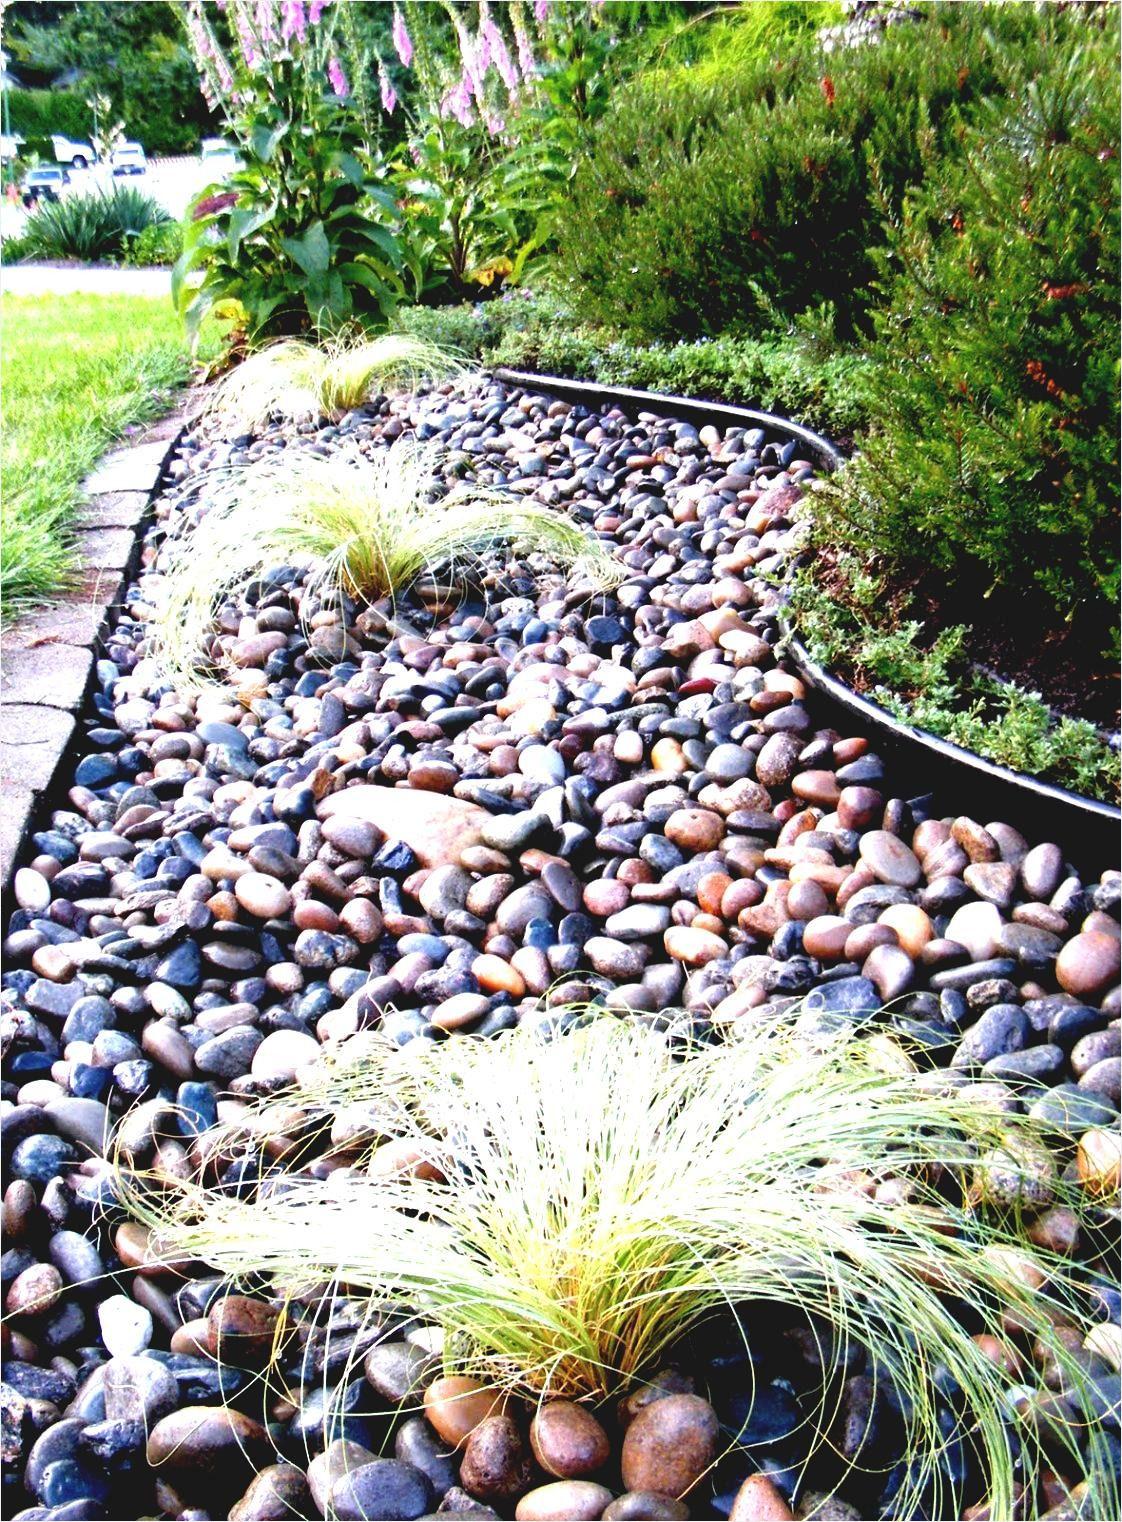 Landscaping Home Depot Landscaping Rocks For Inspiring River Rock Garden River Rock Landscaping Landscaping With Rocks